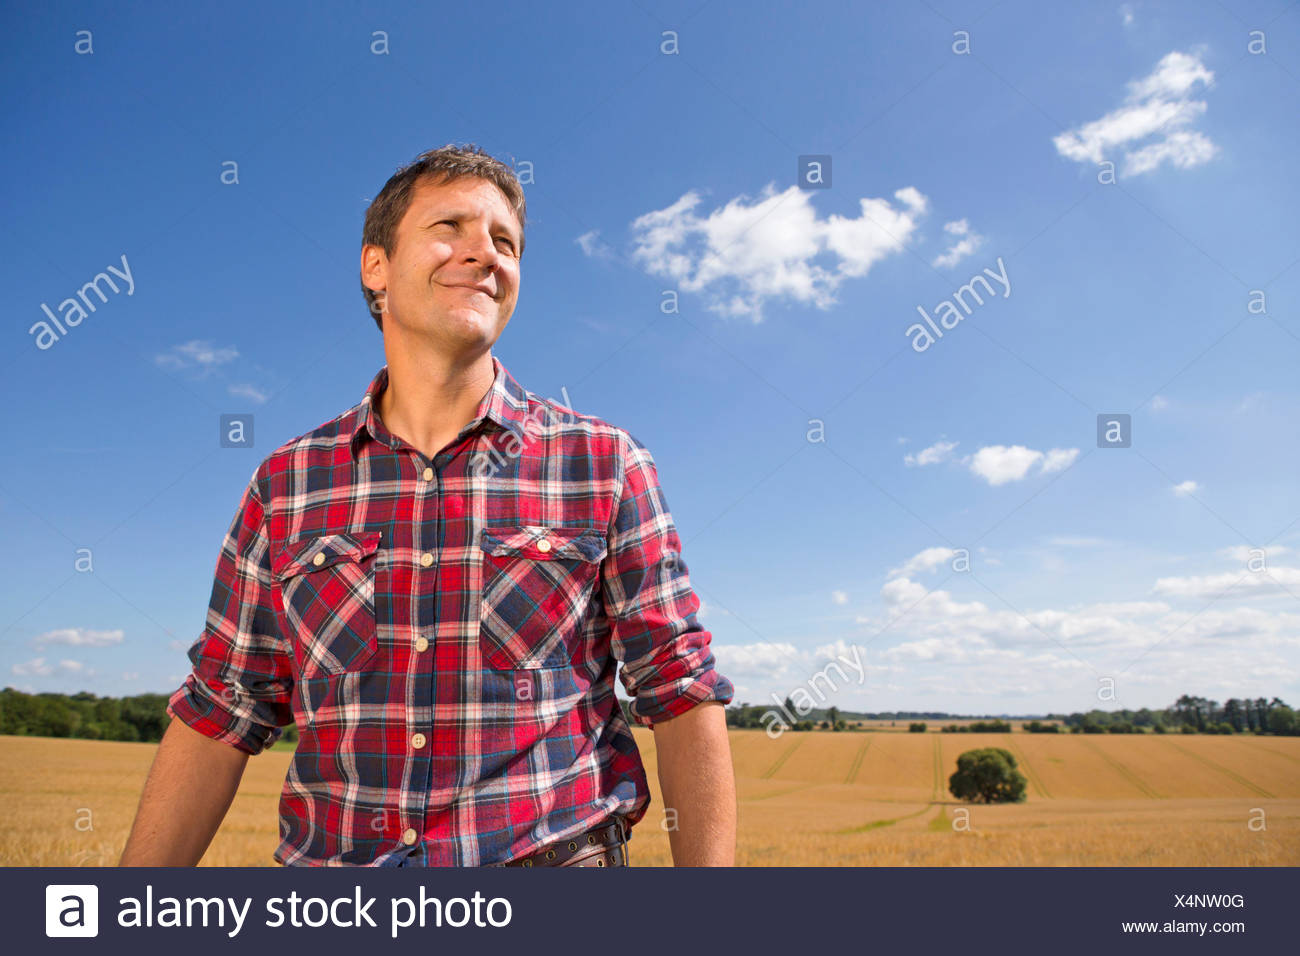 Smiling farmer in sunny rural barley crop field in summer - Stock Image